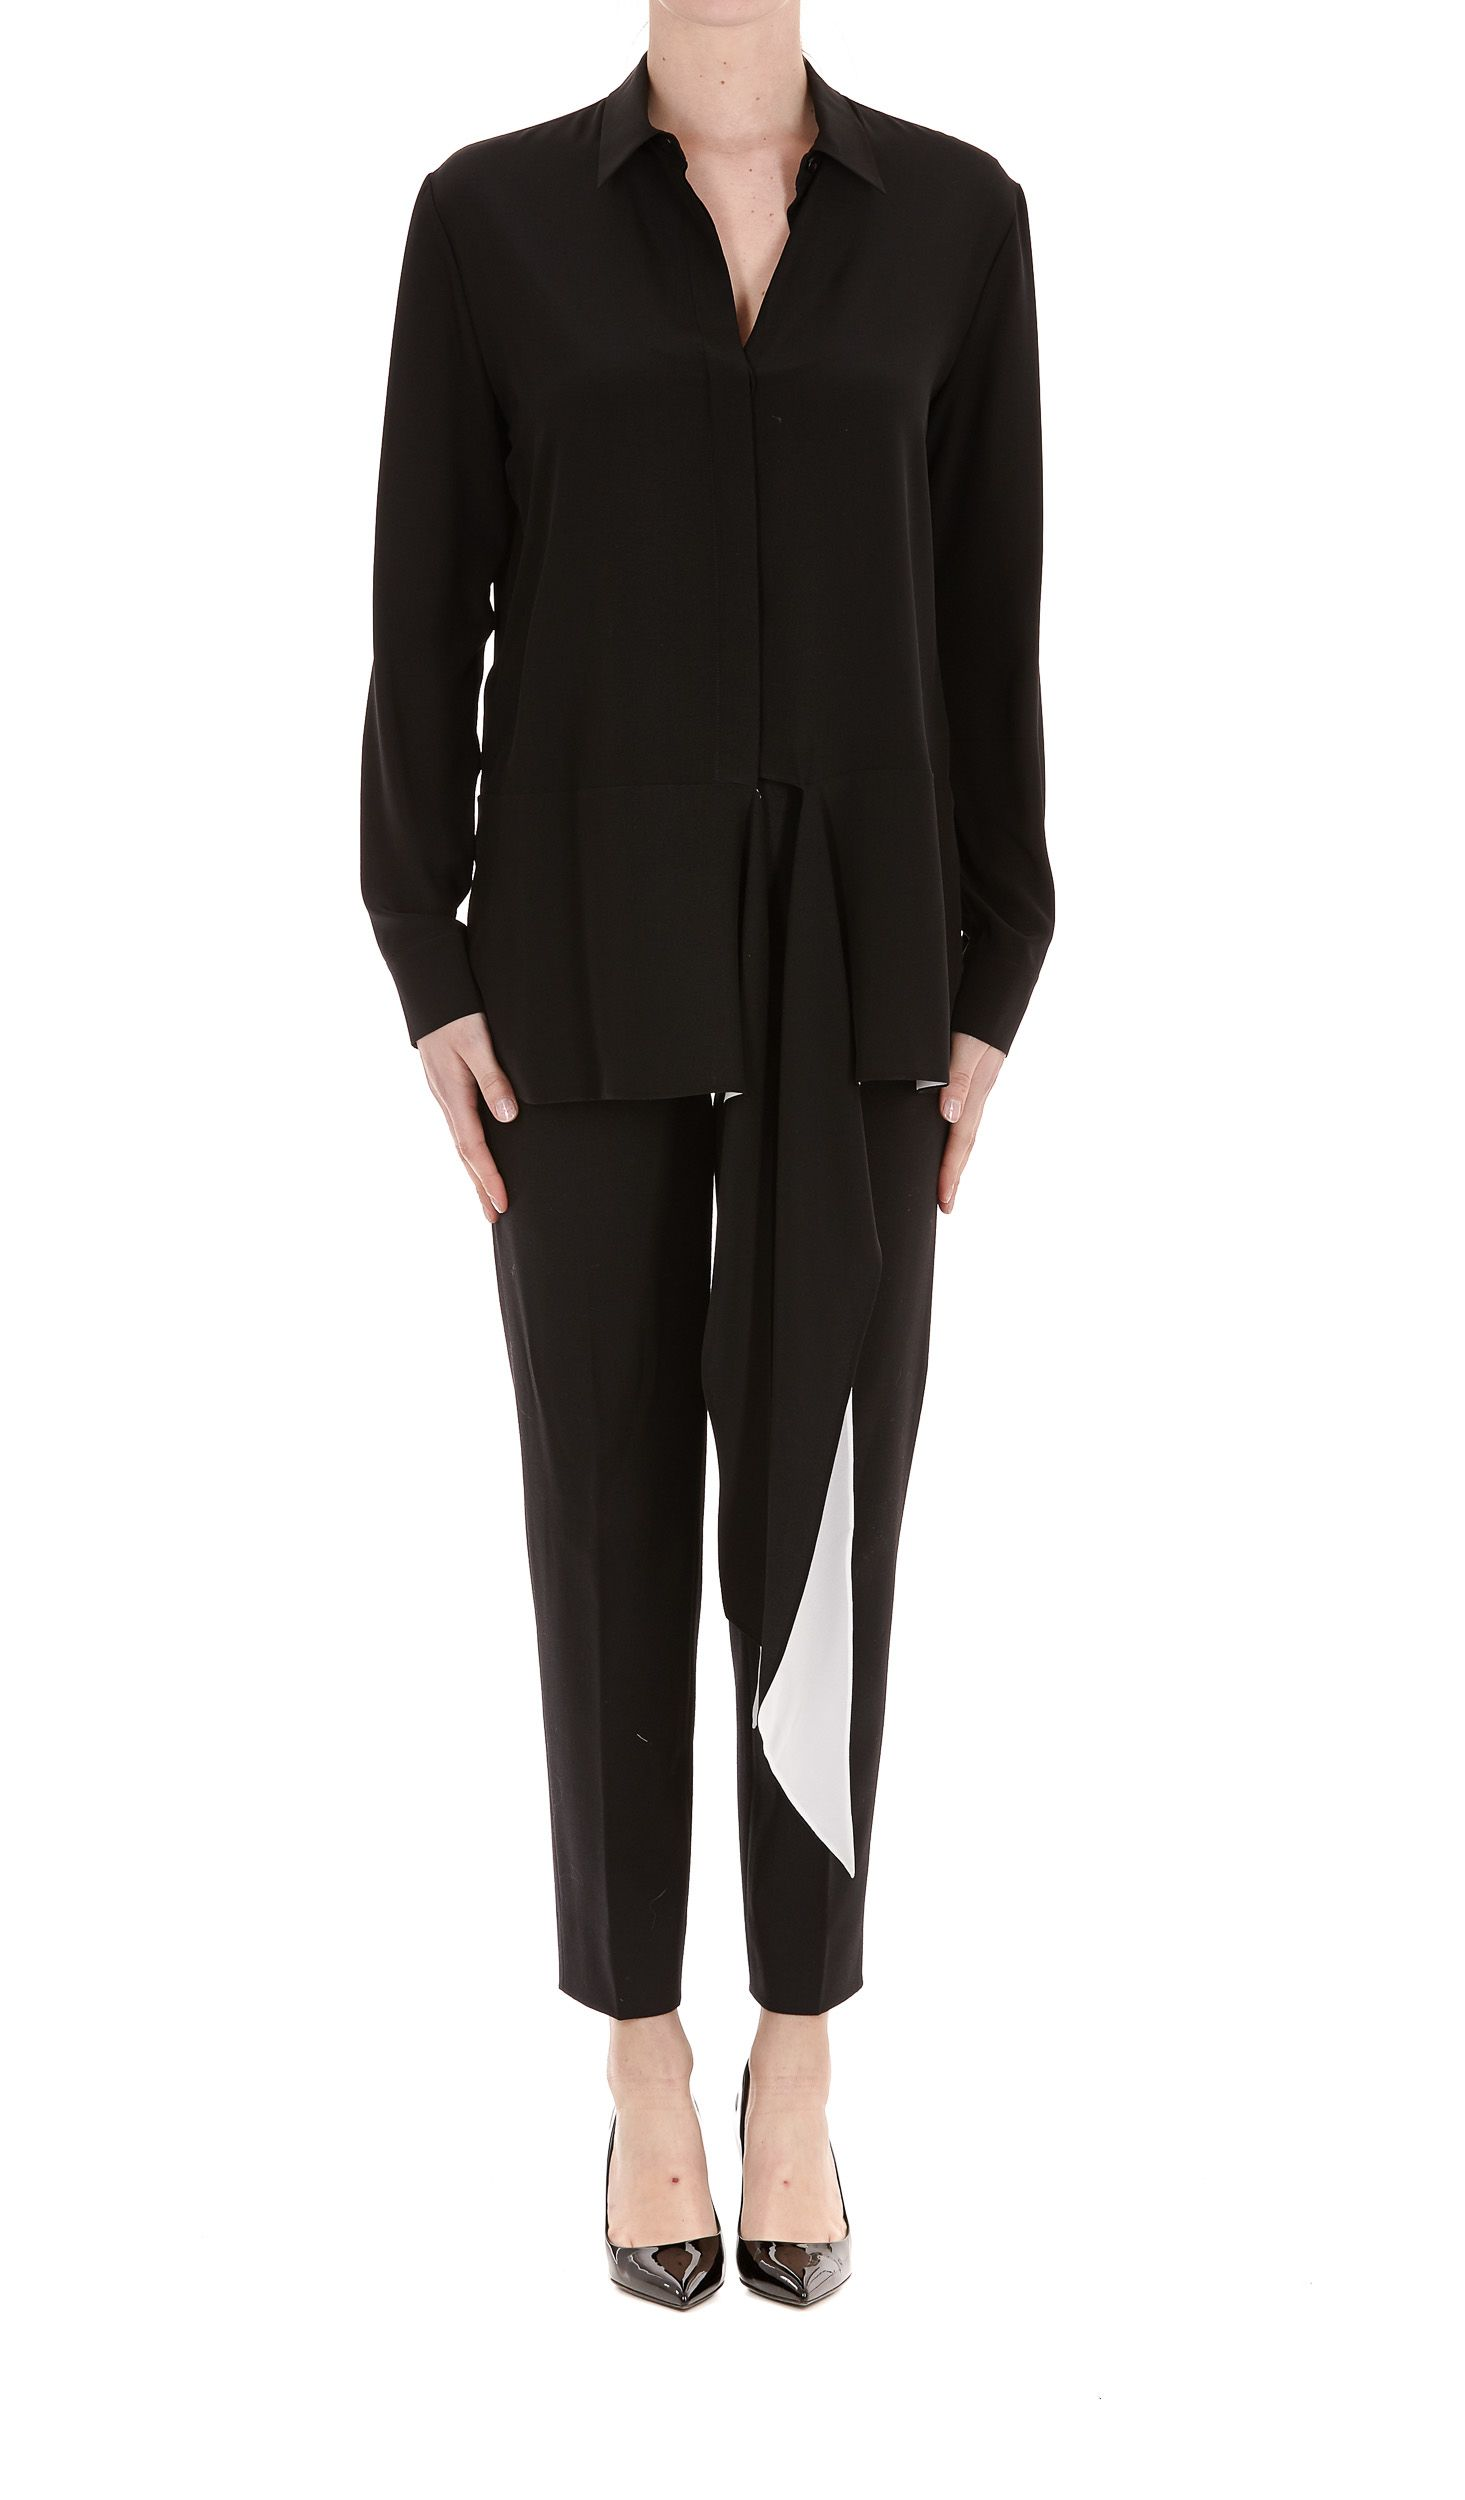 Givenchy Blouson